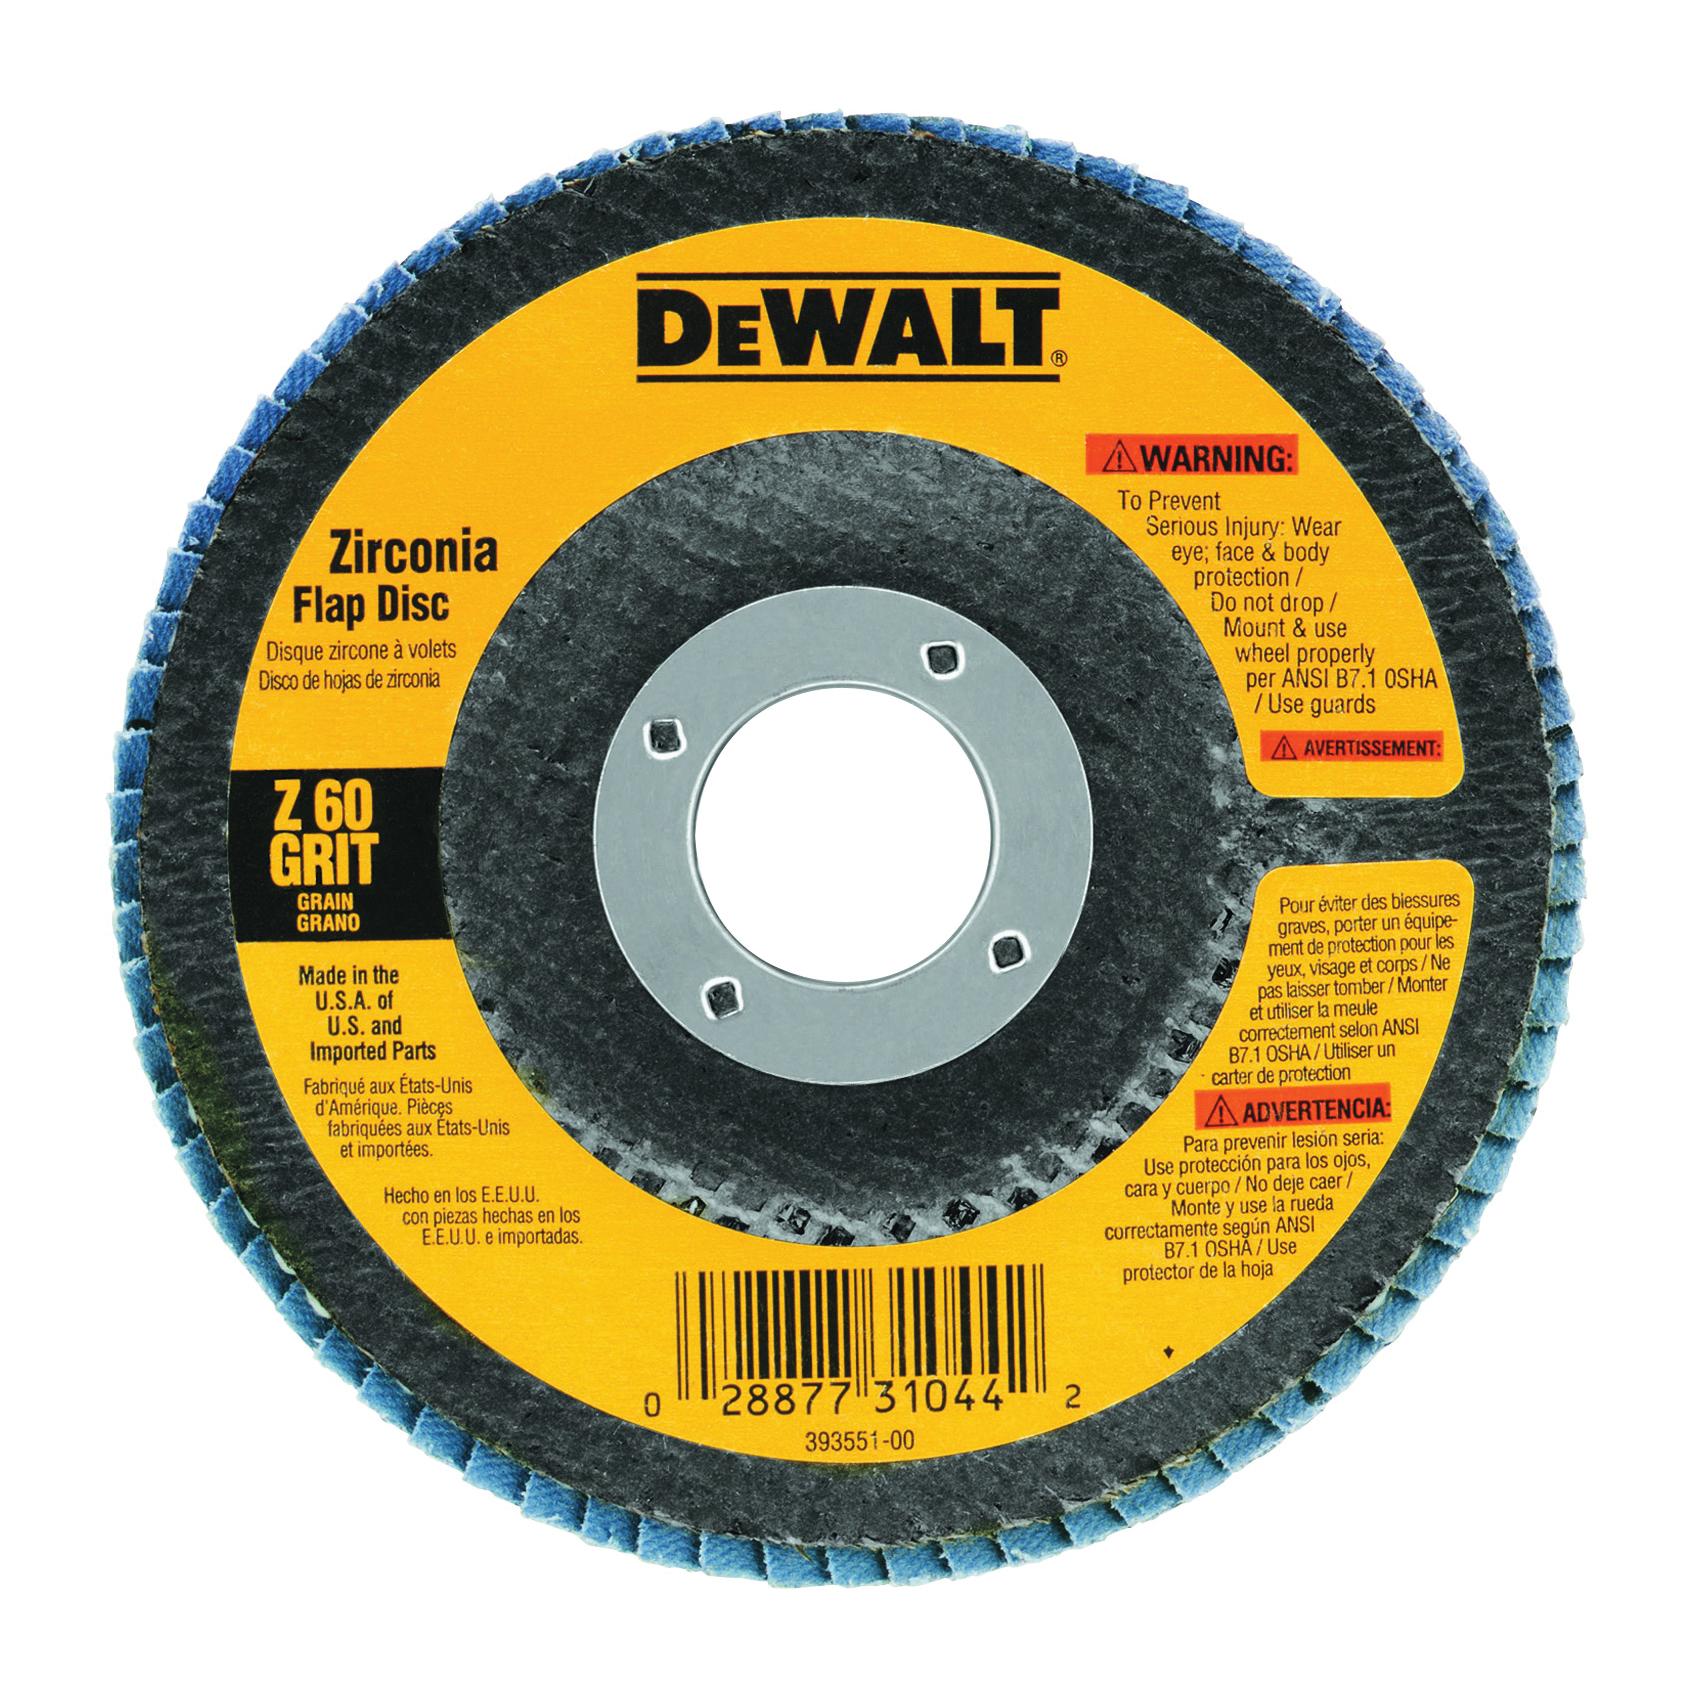 Picture of DeWALT DW8310 Flap Disc, 4-1/2 in Dia, 7/8 in Arbor, Coated, 120 Grit, Zirconia Abrasive, Fiberglass Backing